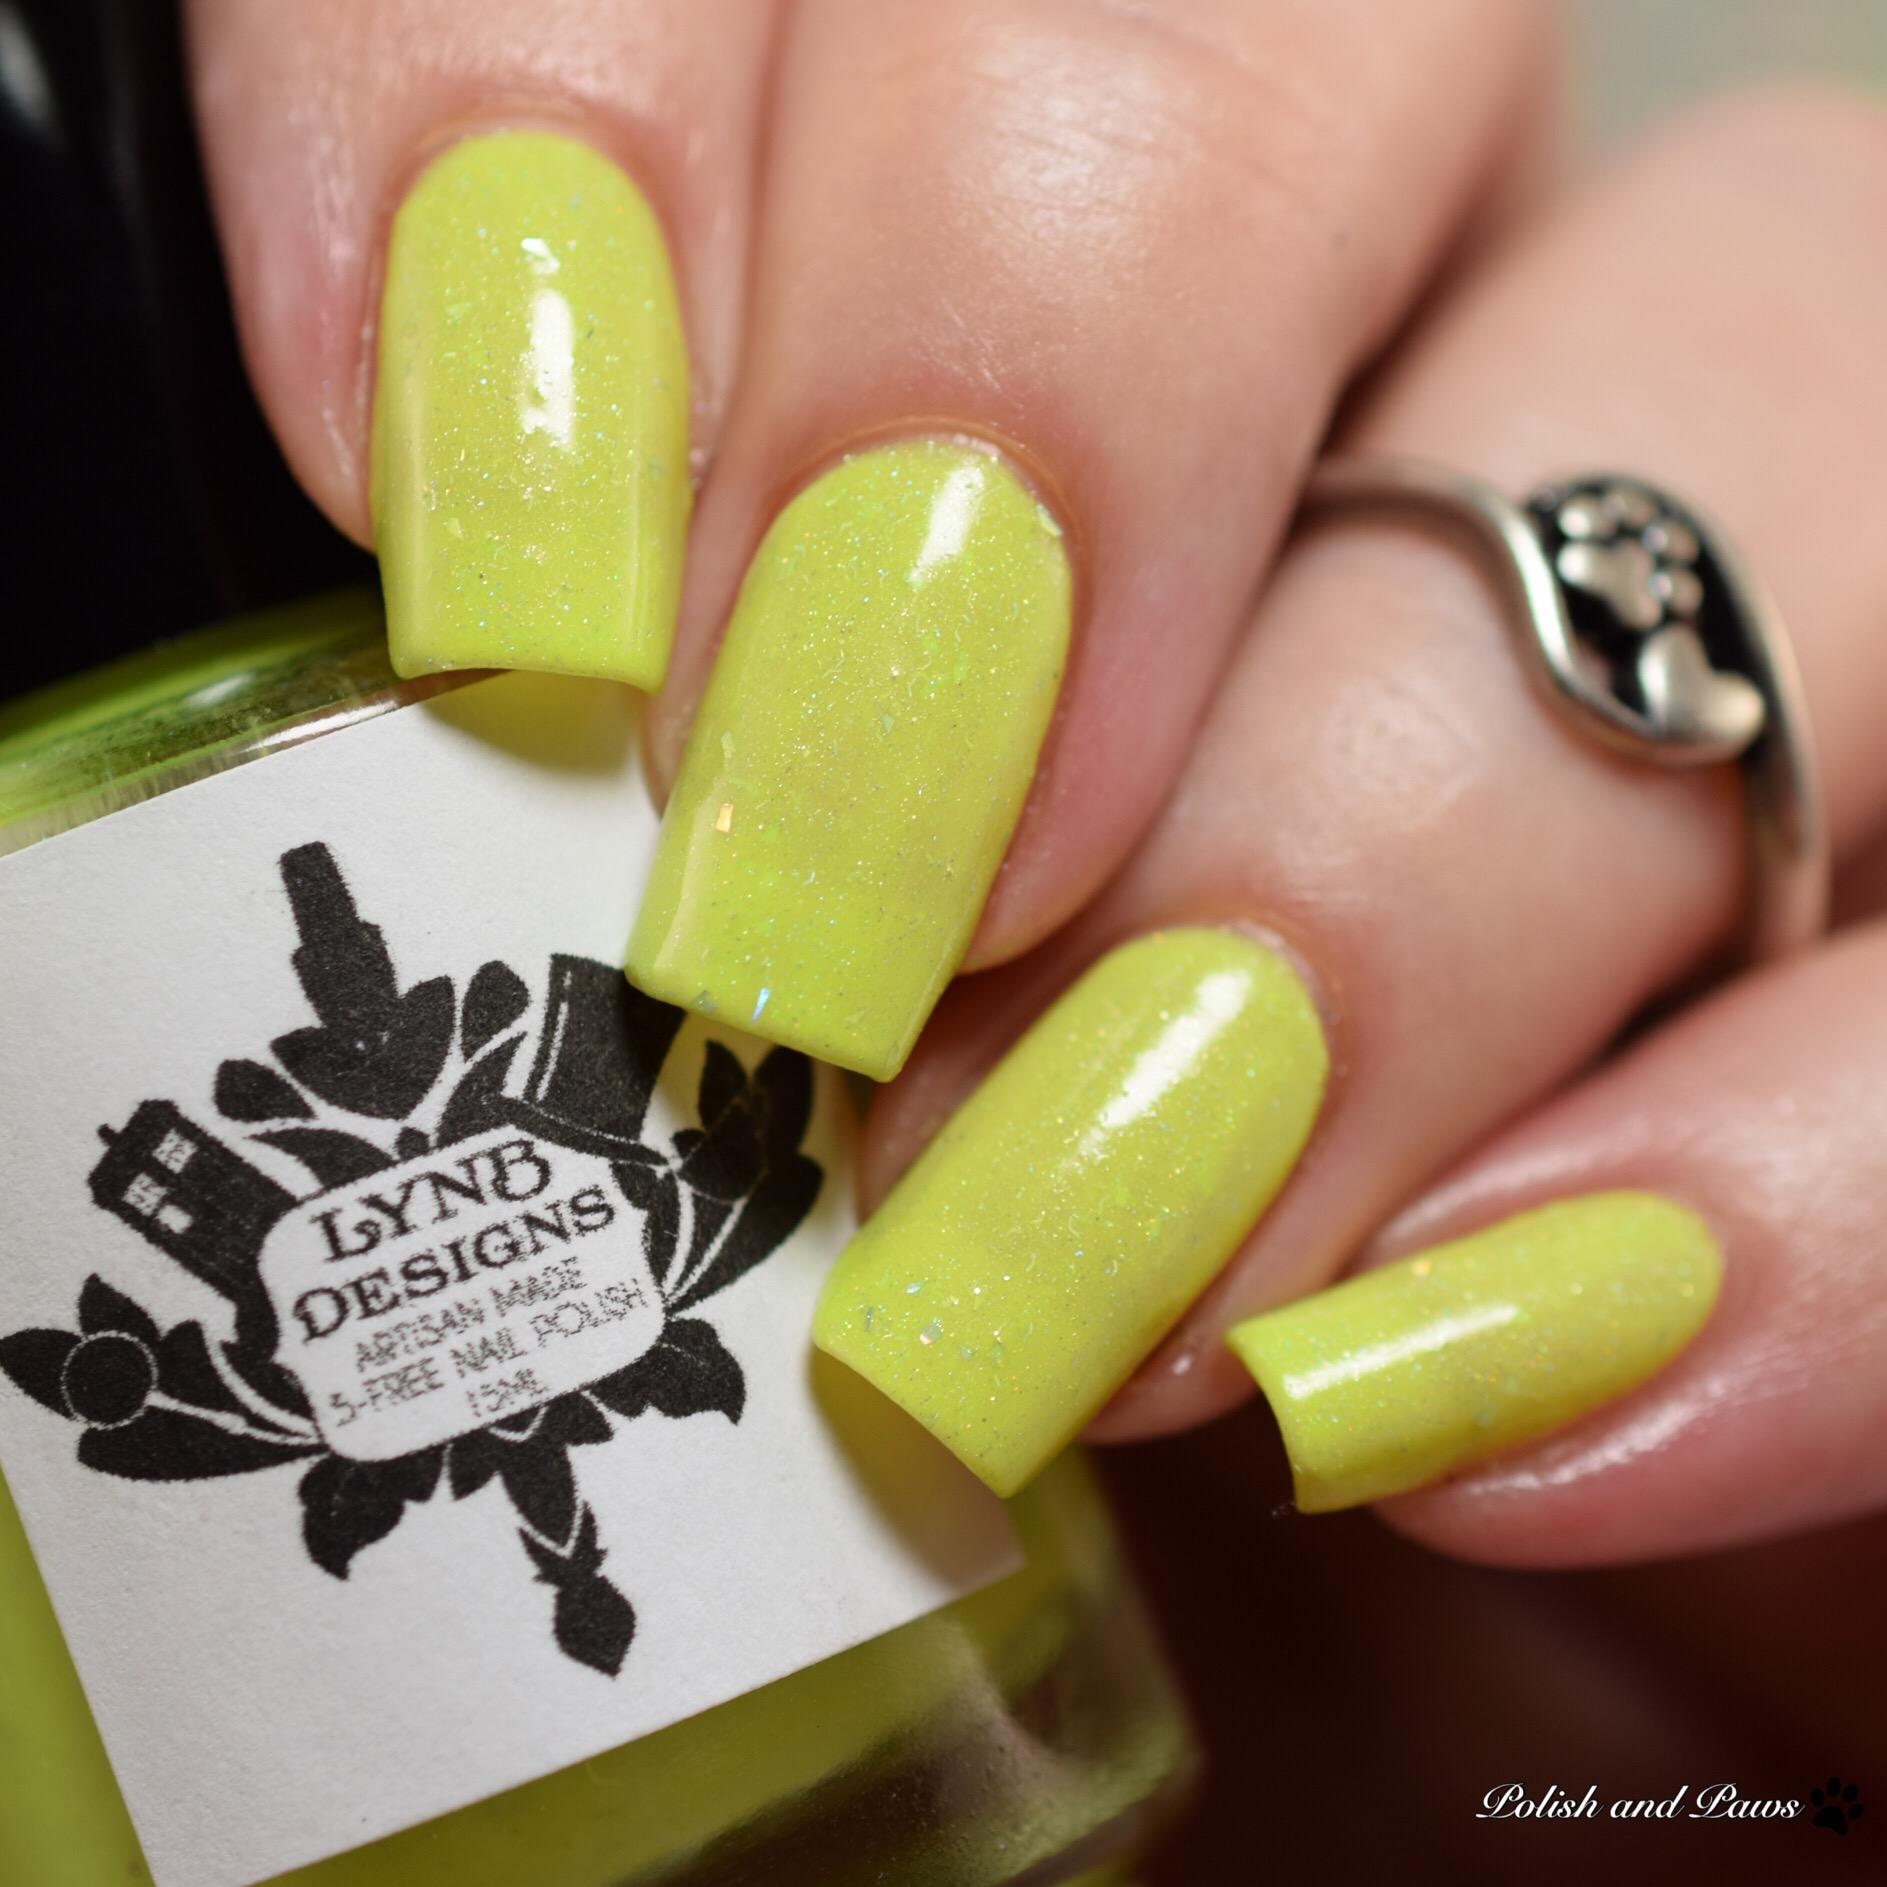 LynB Designs Searing Lemon